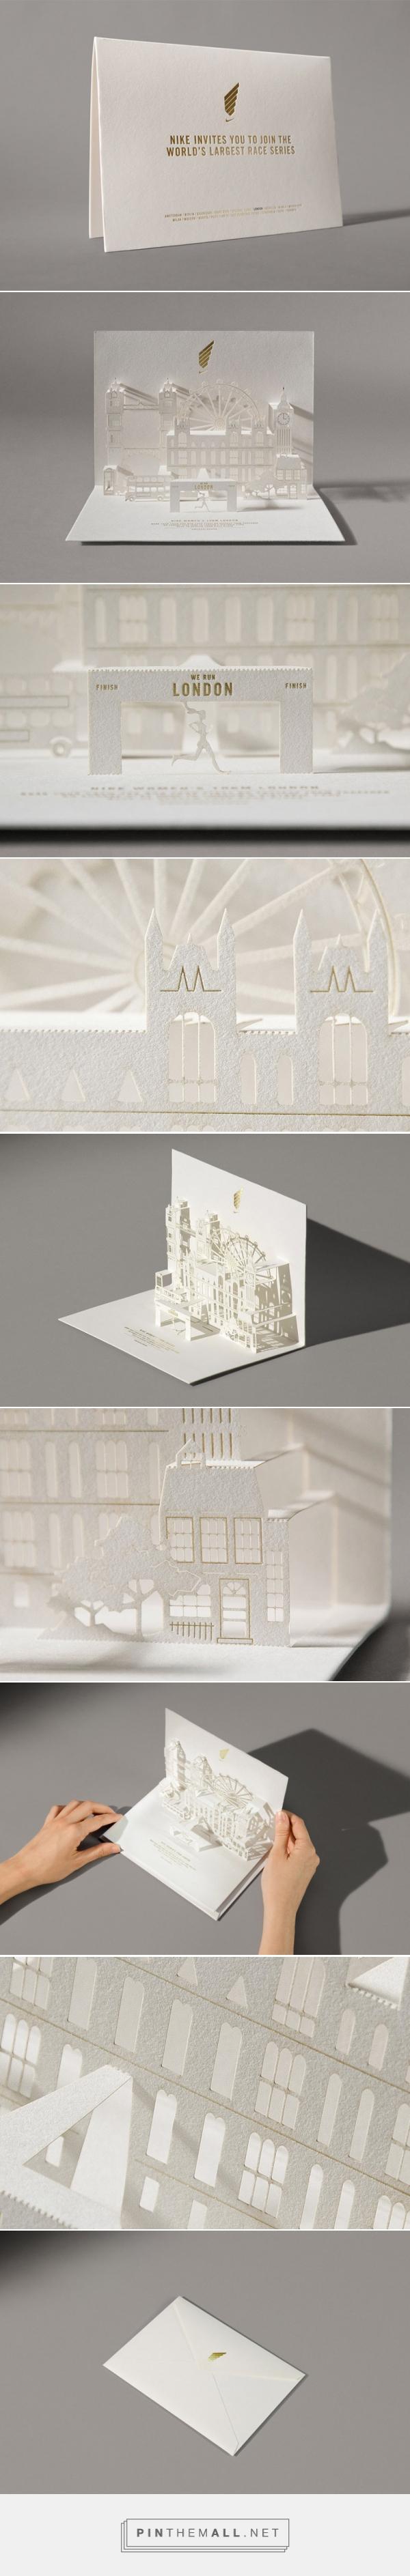 NIKE We Run London Invitation by Happycentro | Inspiration Grid | Design Inspiration - created via https://pinthemall.net